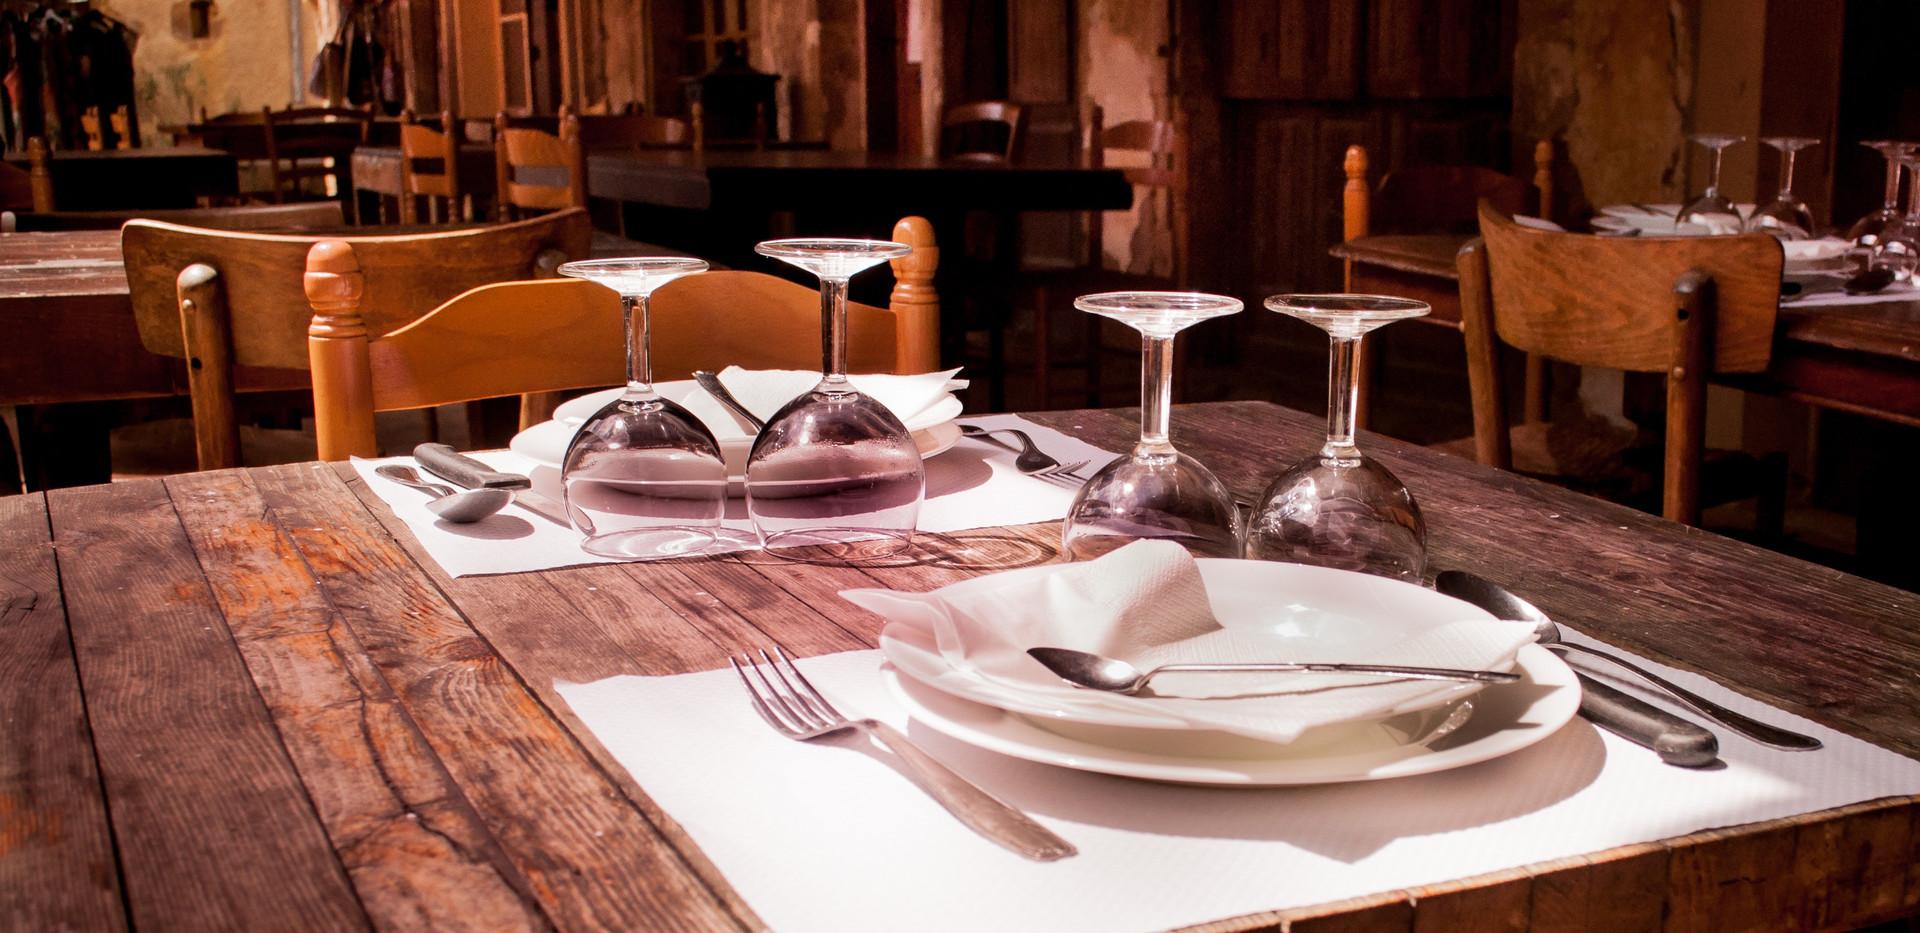 chairs-cutlery-fork-9315.jpg